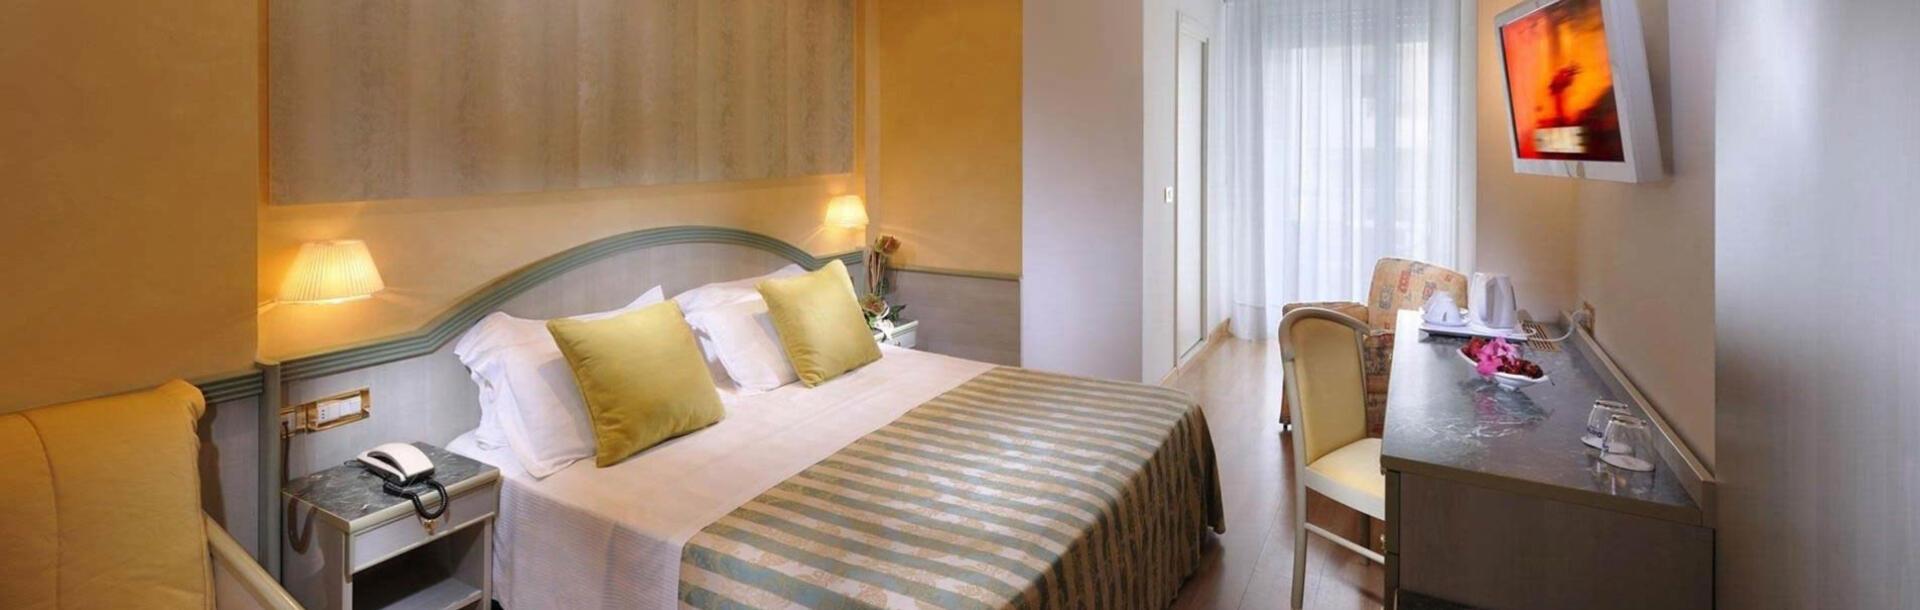 hotel-montecarlo hu komfort-szoba-bibione 014